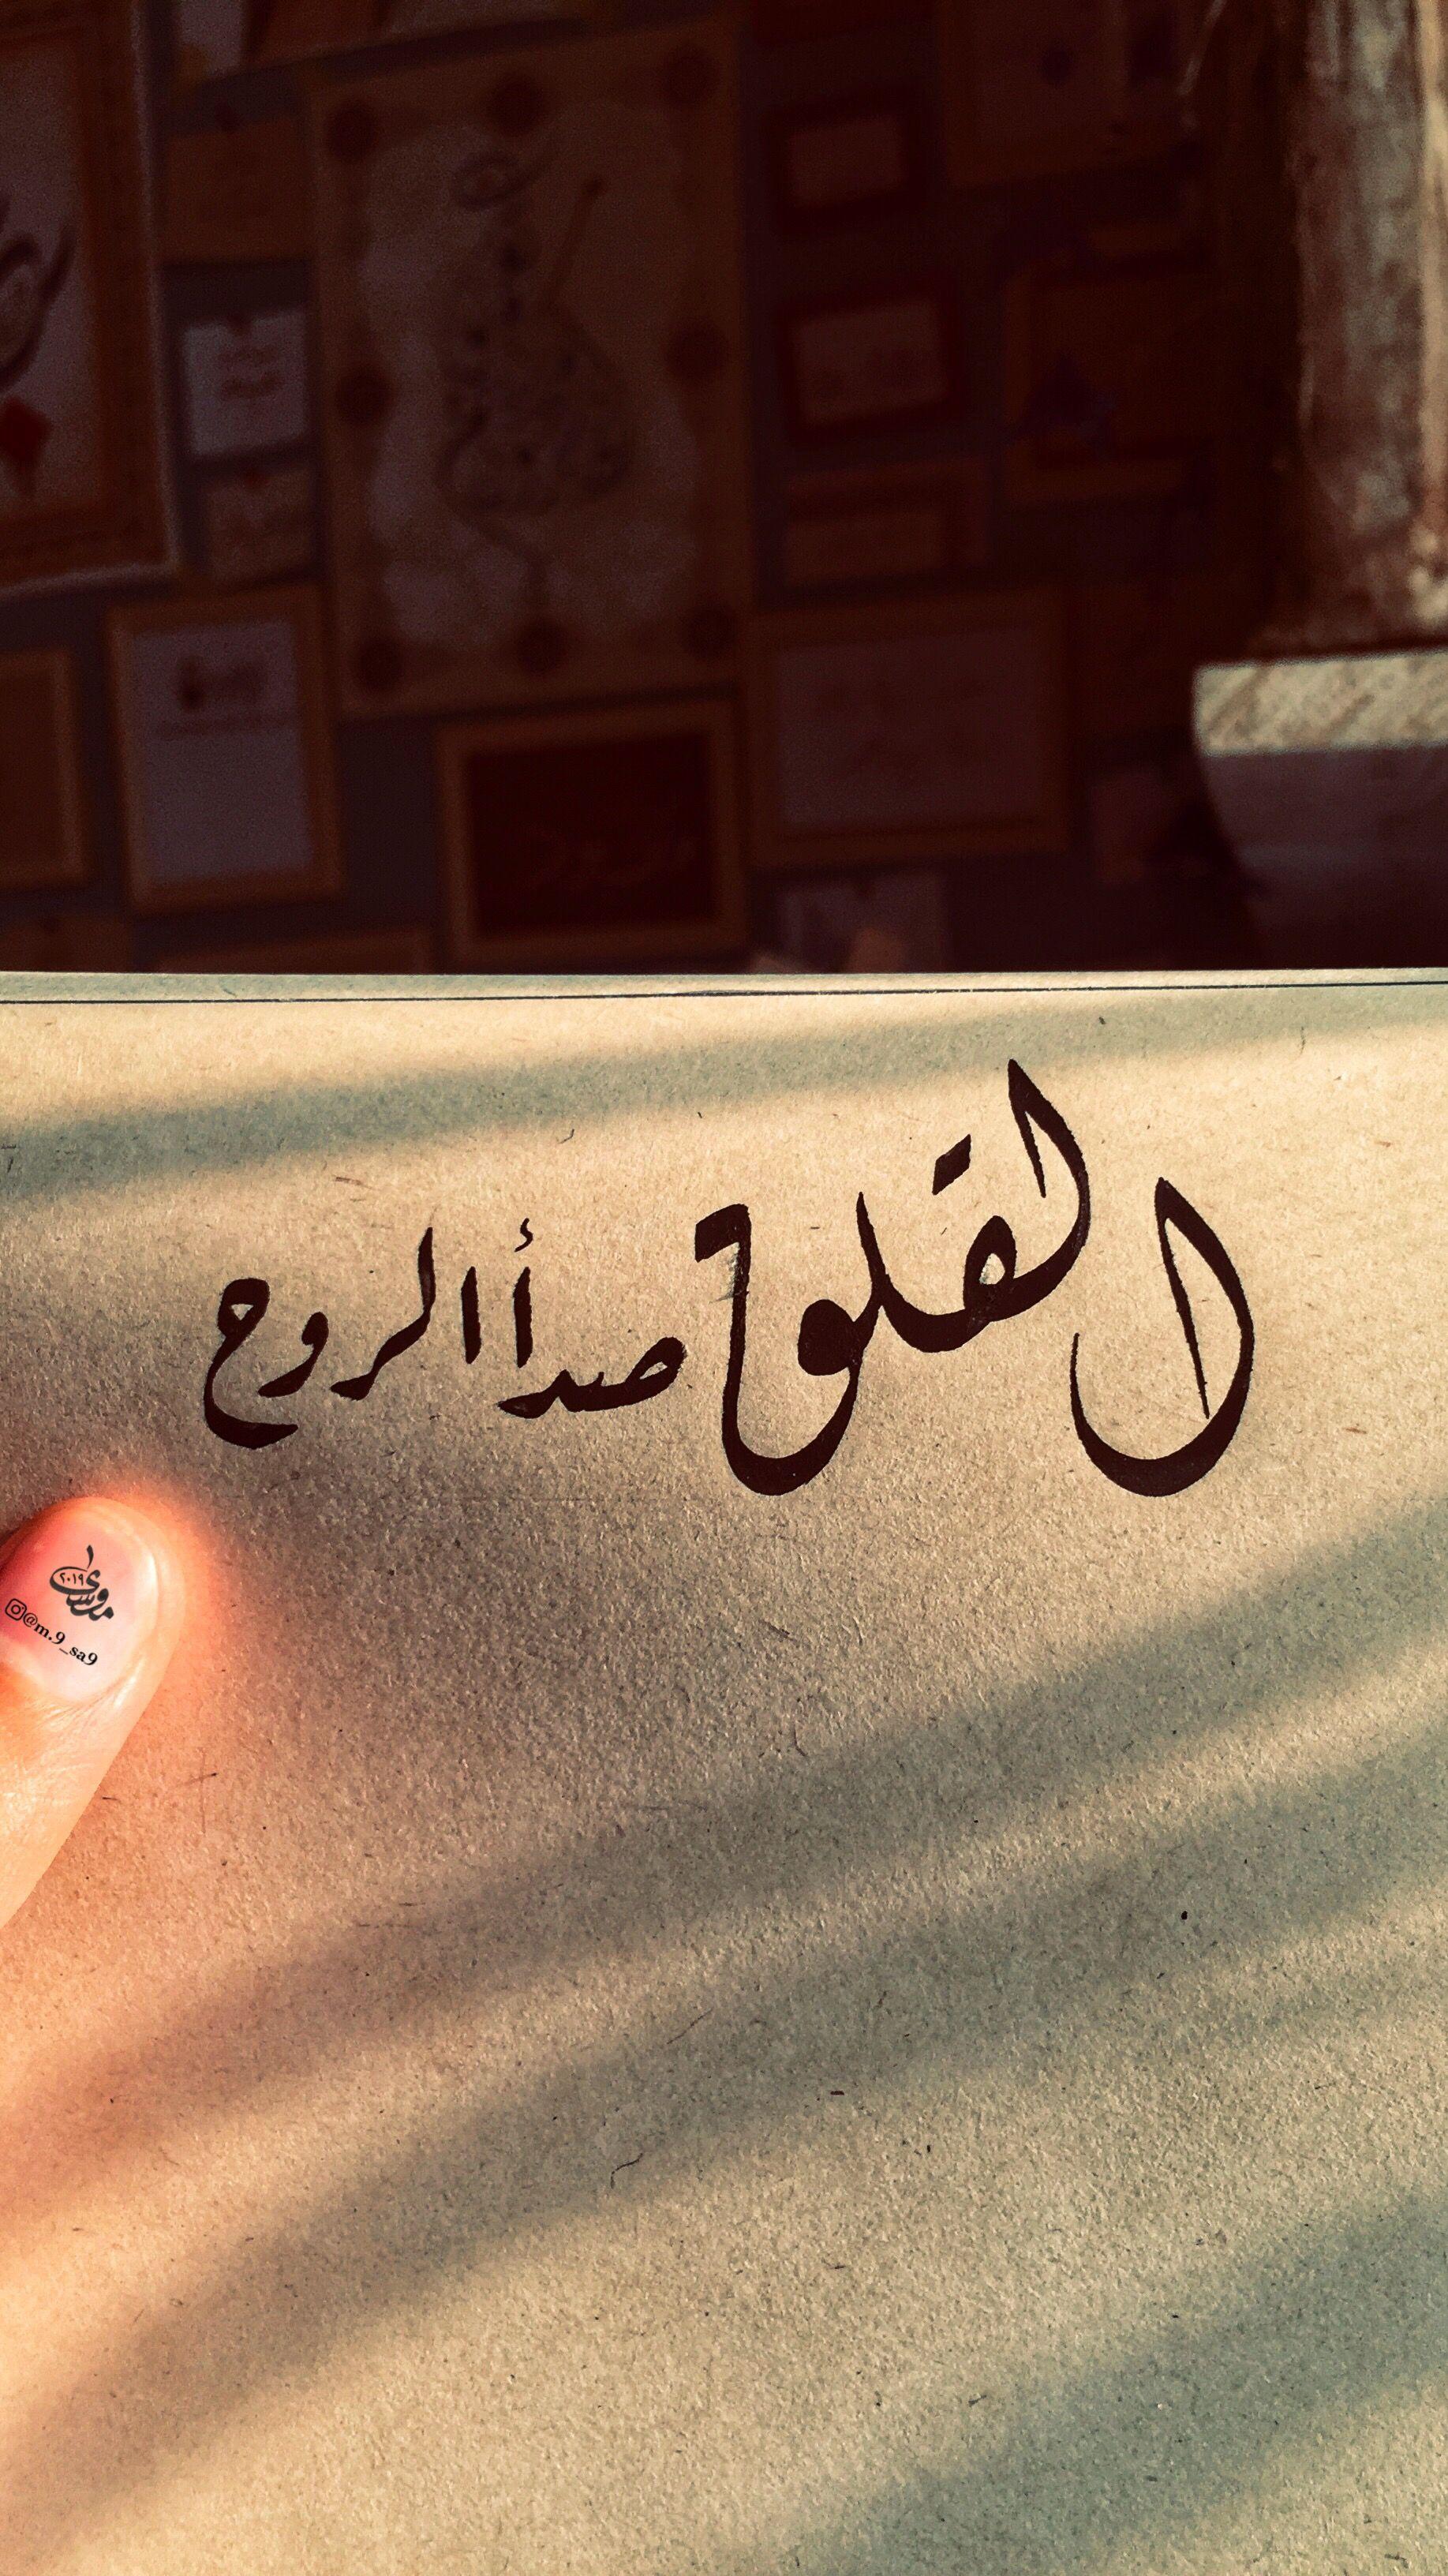 Calligraphy Lifequotes Calligraphyart Art اقوال Artwork Quotes حكم Arabiccalligraphy Poetryquotes رمزيات Arabic Writing Art Tattoo Quotes Quotes